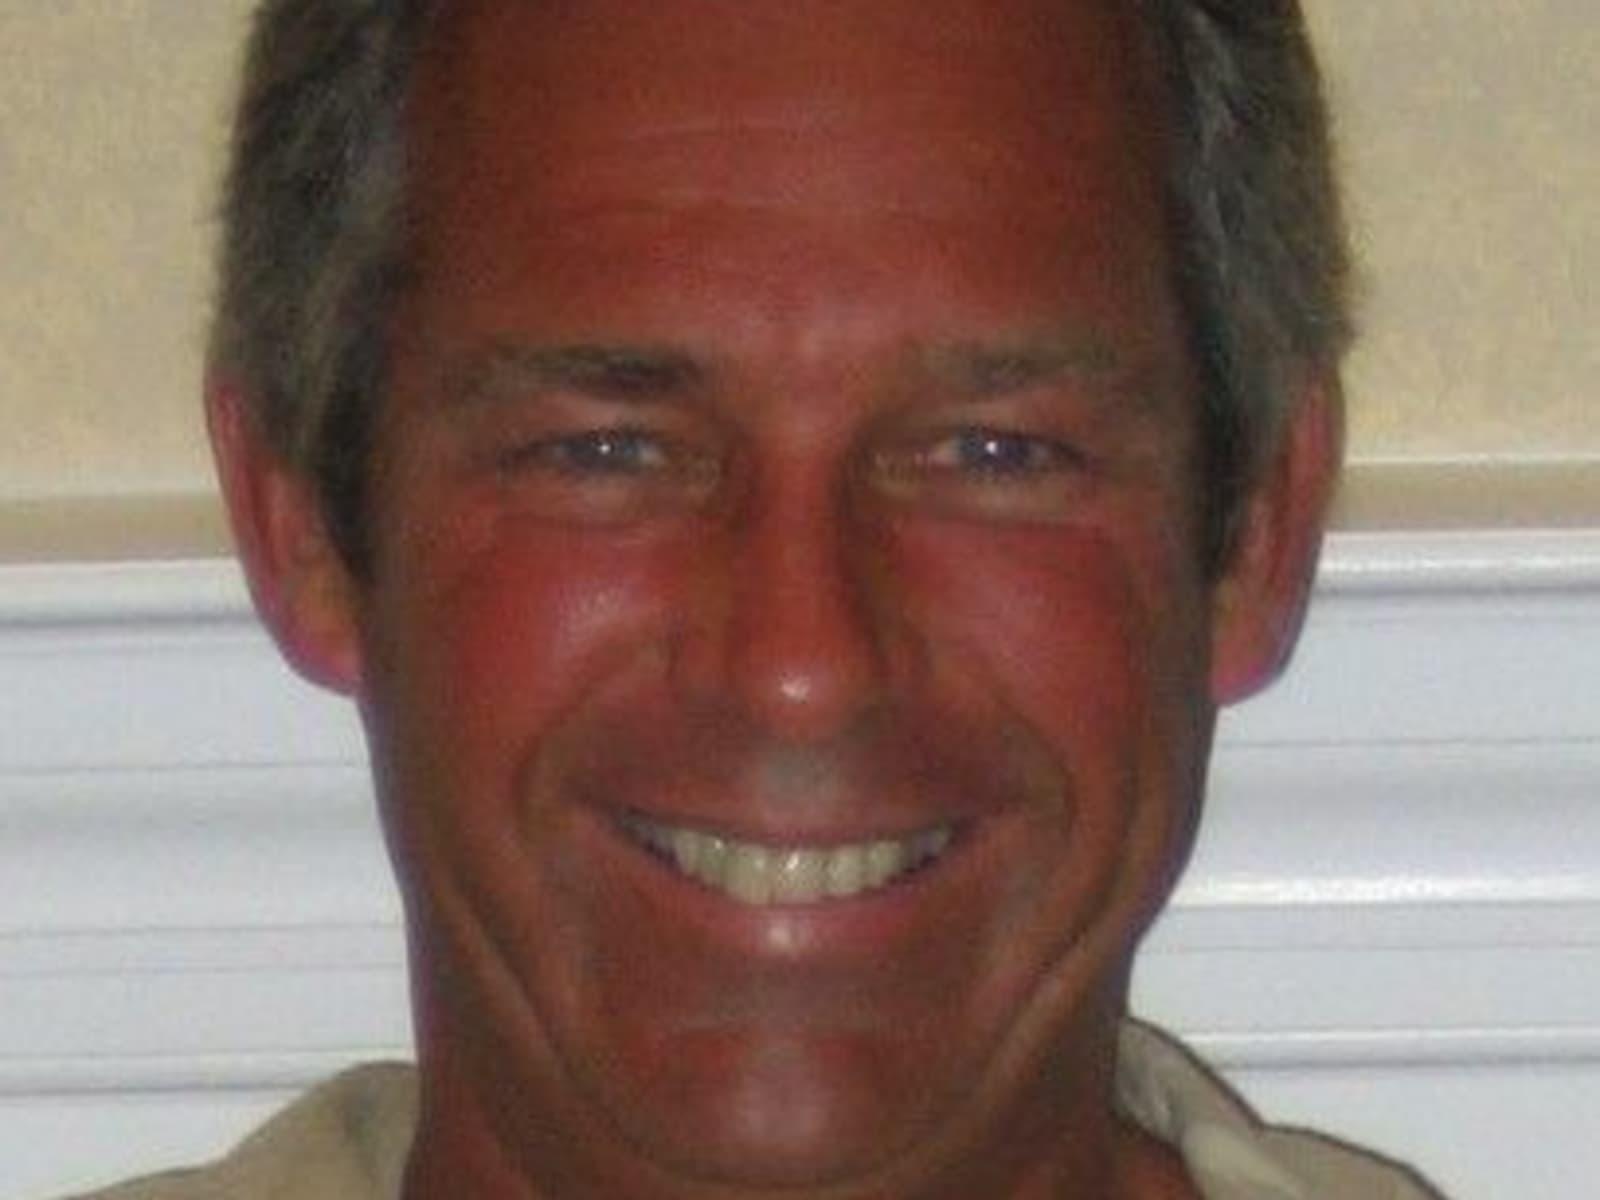 Ken from Nassau, Bahamas